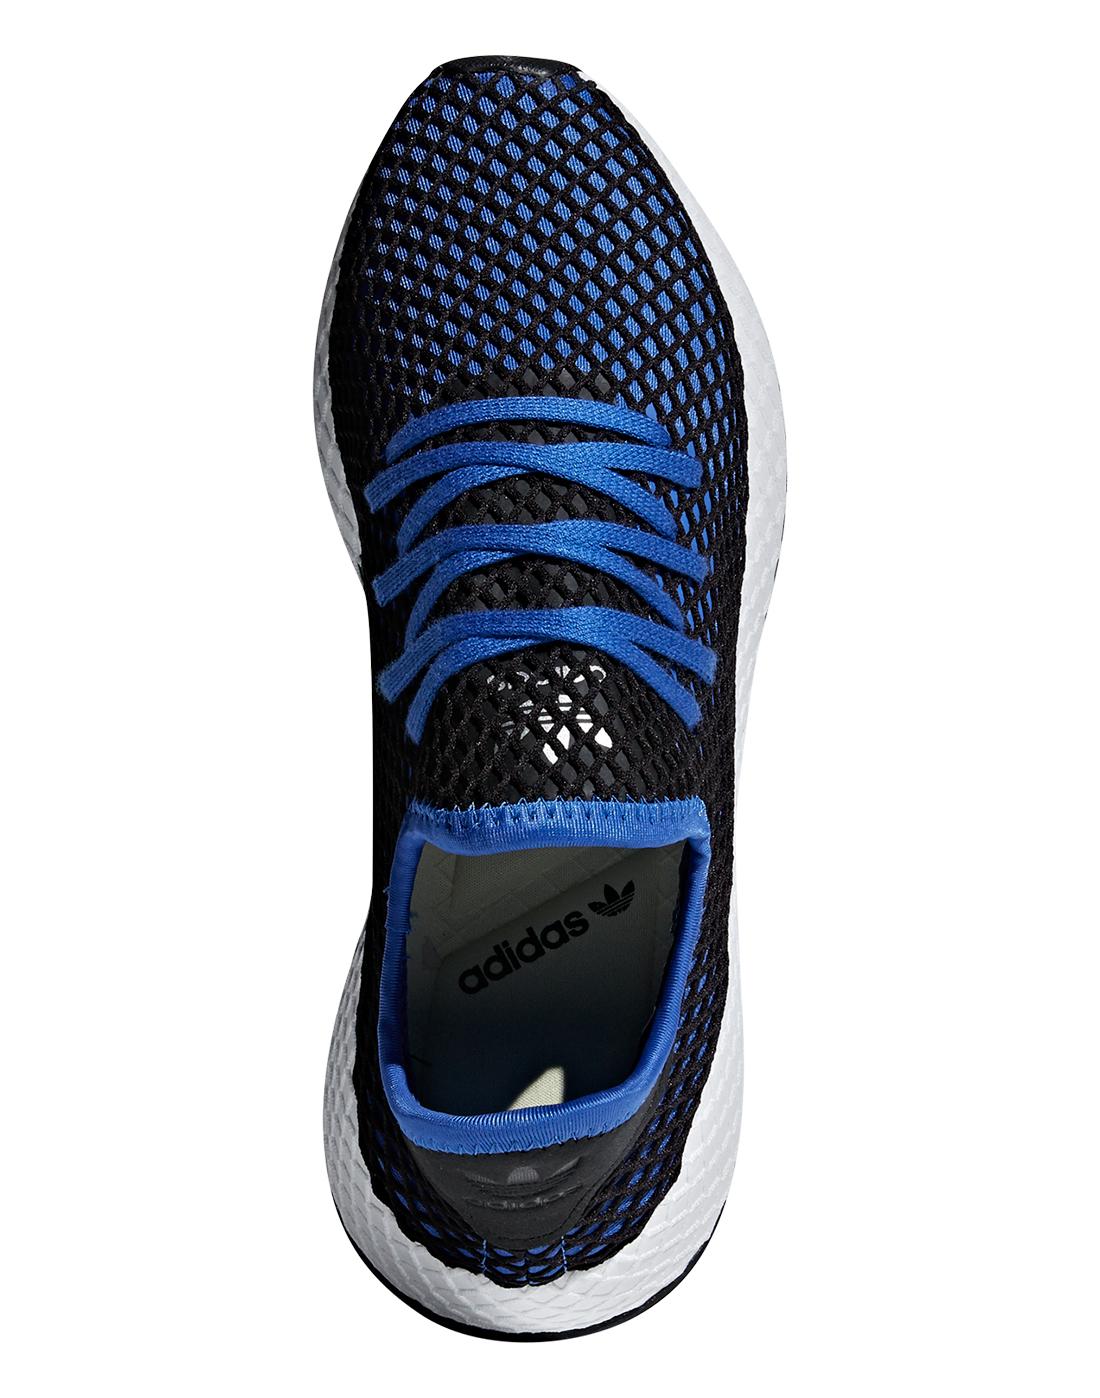 3dcf907d8 Men s adidas Originals Deerupt